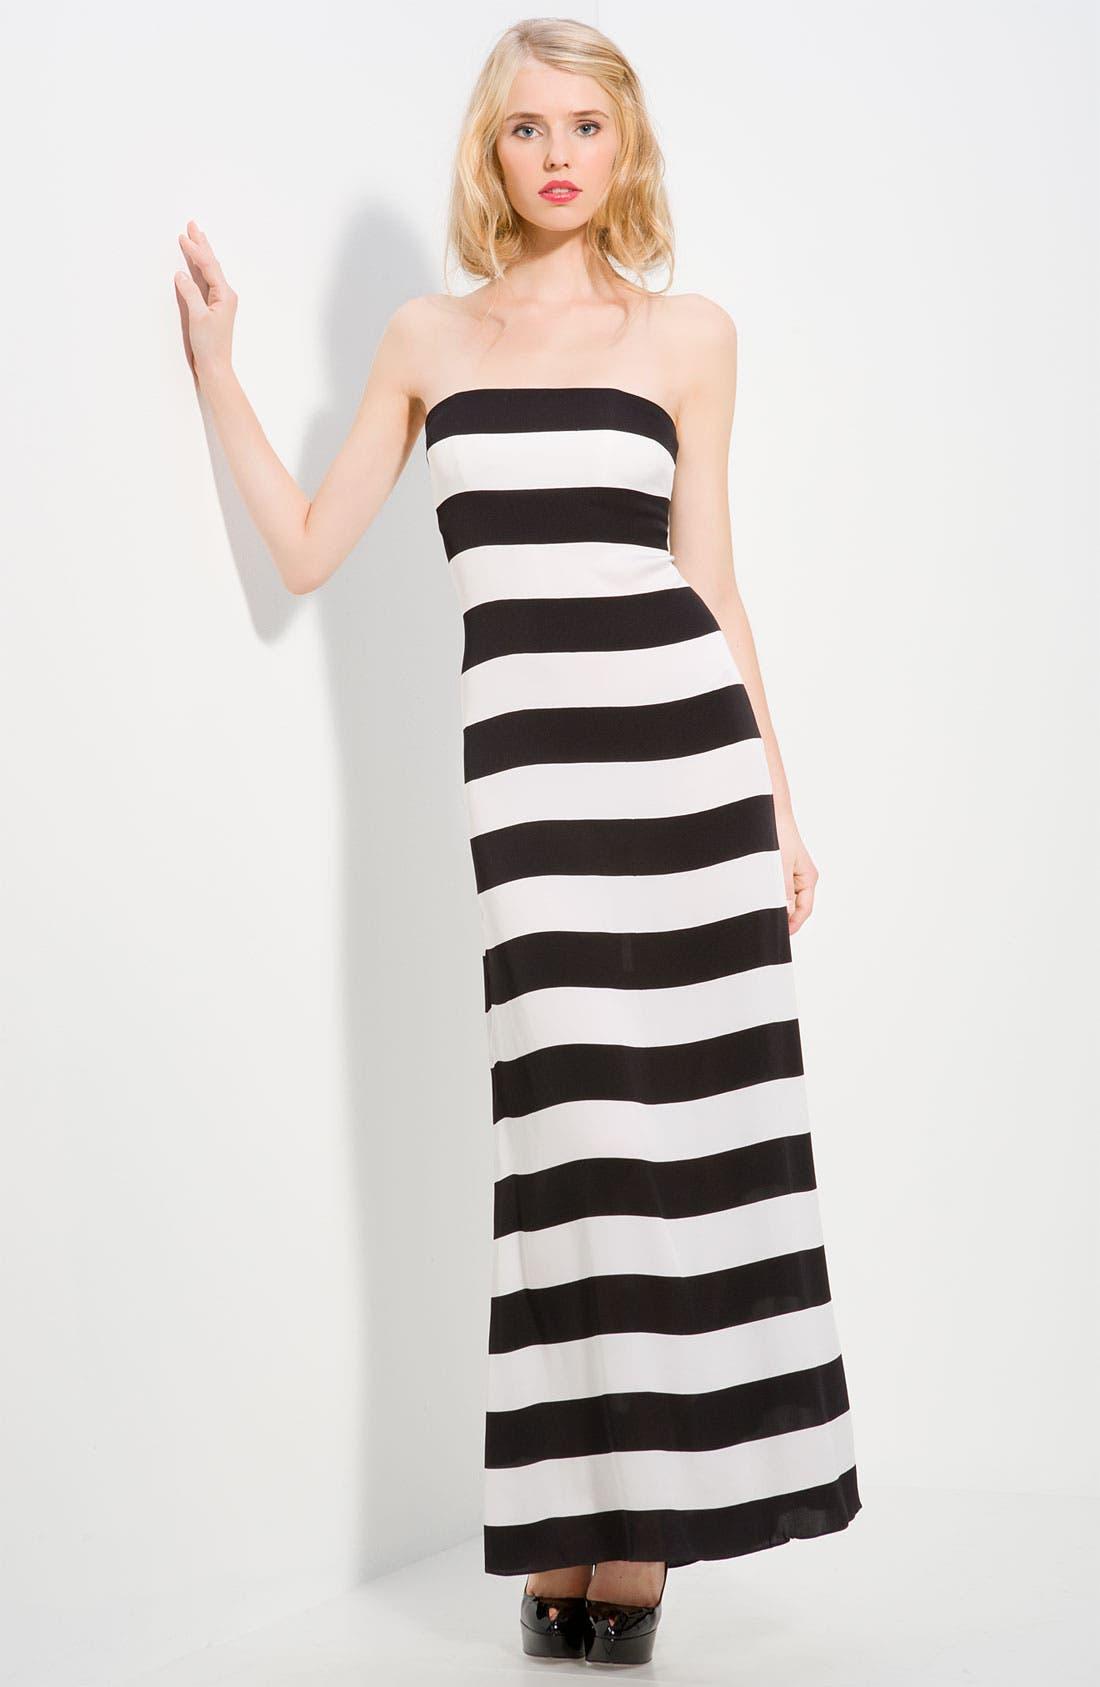 'Chandra' Stripe Strapless Maxi Dress,                             Main thumbnail 1, color,                             006